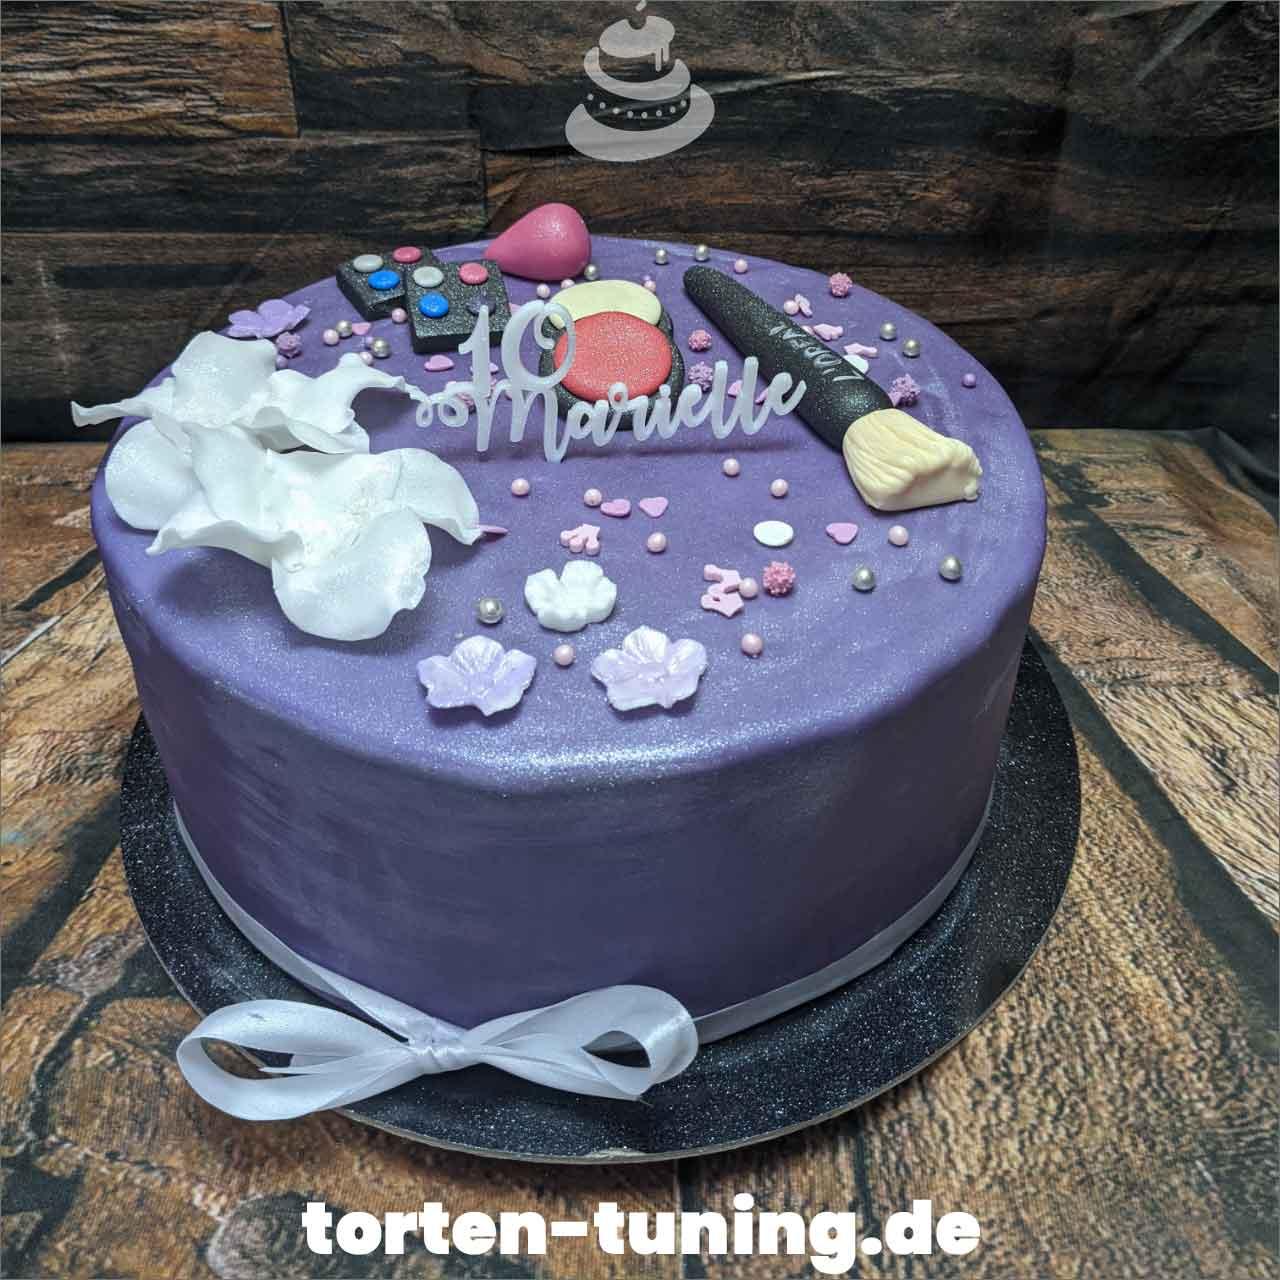 Schminke Dripcake Obsttorte Geburtstagstorte Motivtorte Torte Tortendekoration Torte online bestellen Suhl Thüringen Torten Tuning Sahnetorte Tortenfiguren Cake Topper